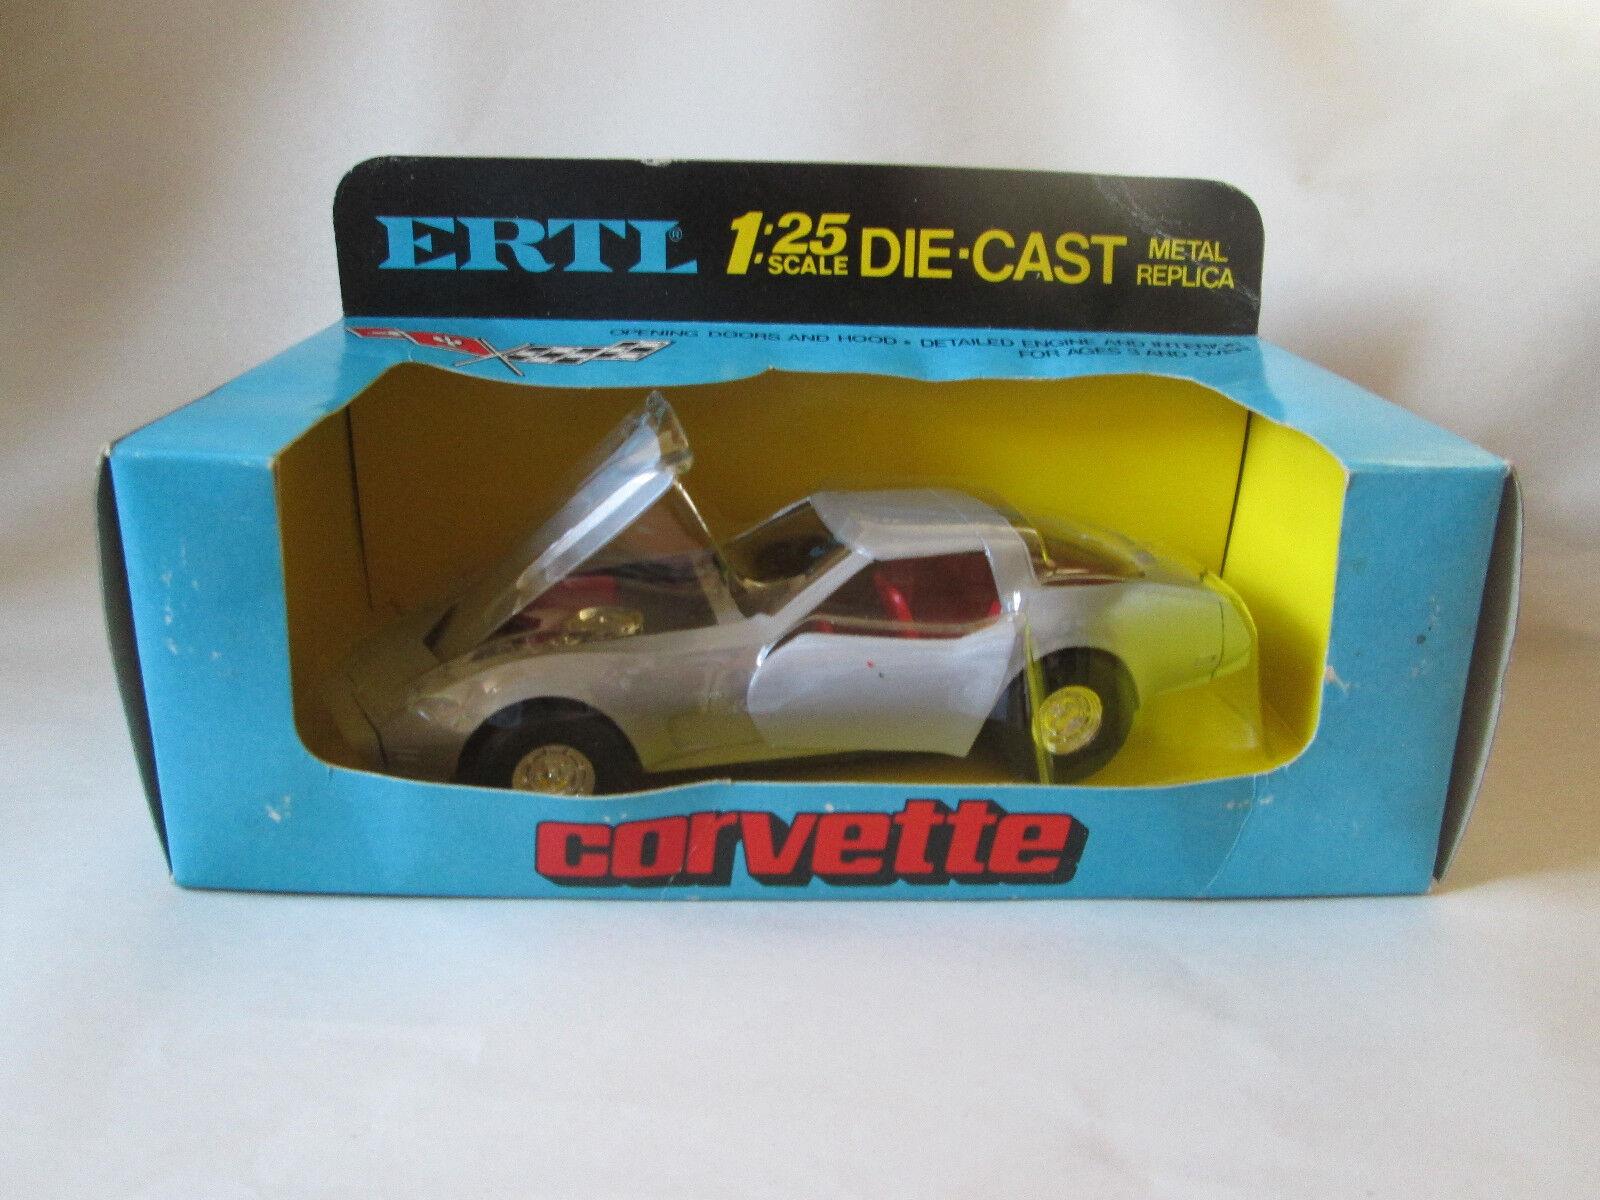 Ertl Chevrolet Chevrolet Chevrolet Corvette Stingris 1970 Coche Deportivo 1 25 Plata Replica  1676 Hong Kong 6456d2